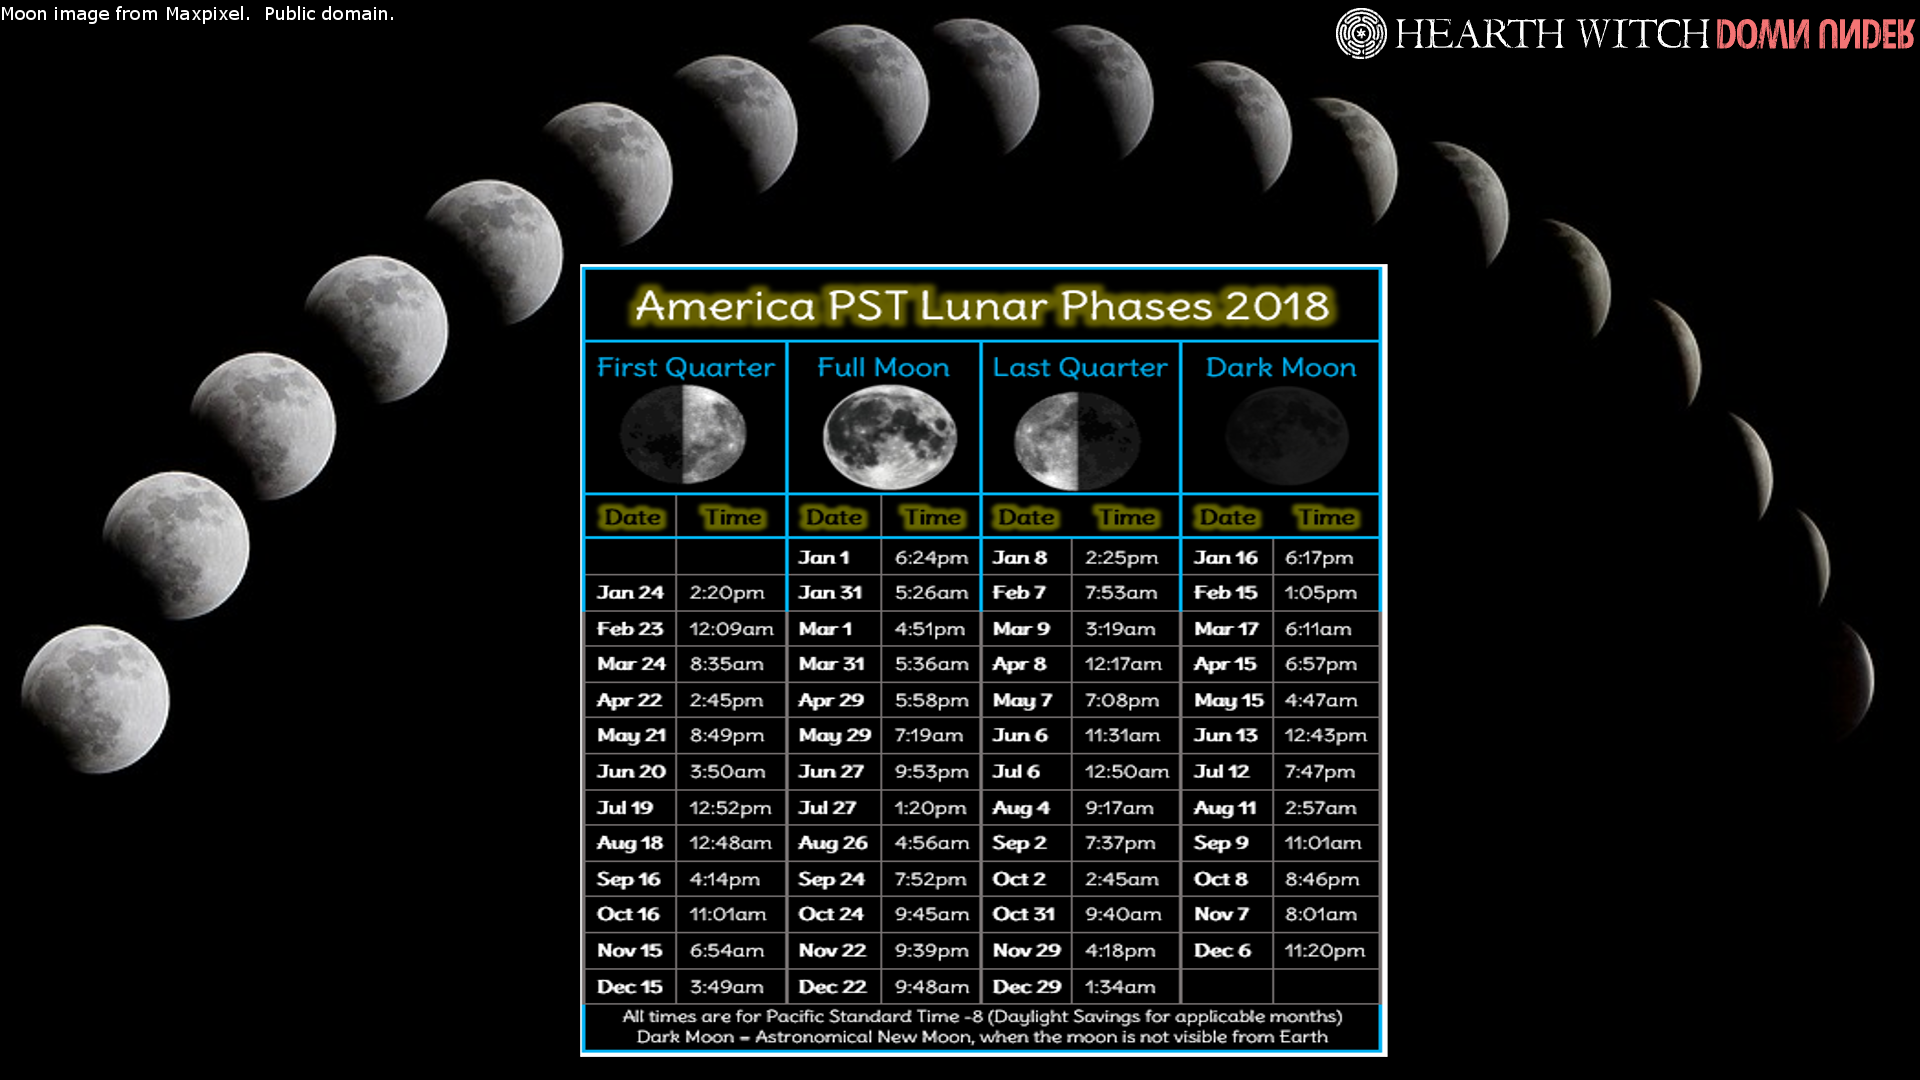 USA PST moon phase wallpaper 2018 | Bekah Evie Bel